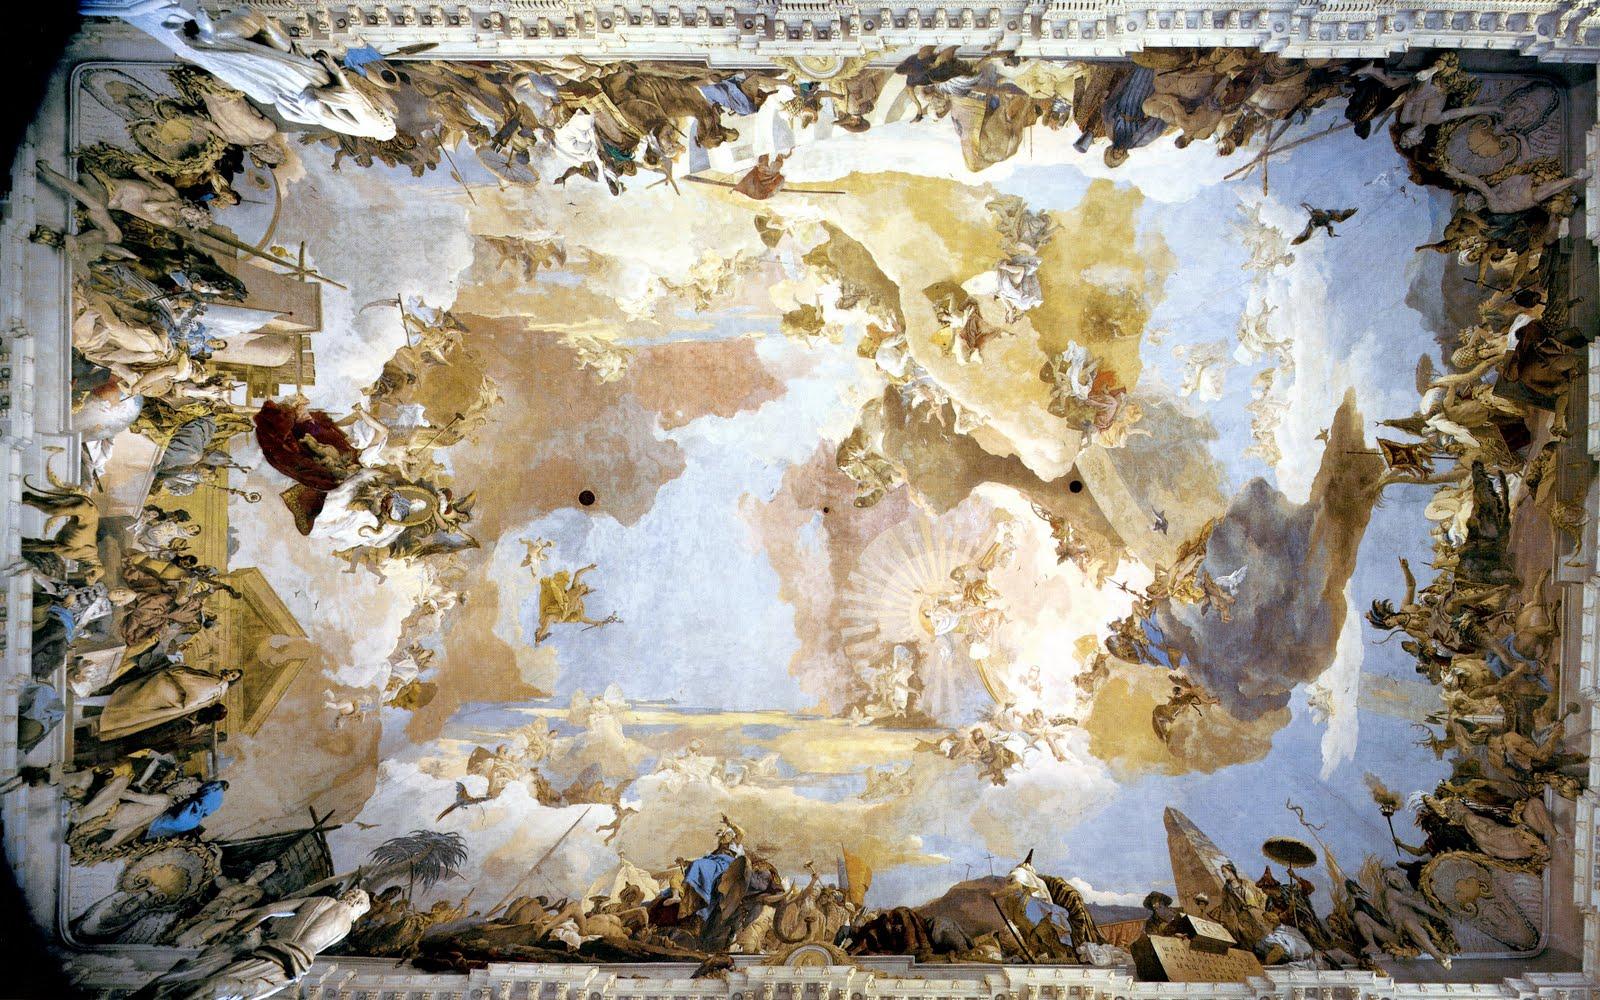 cityzenart: Tiepolo ceiling paintings